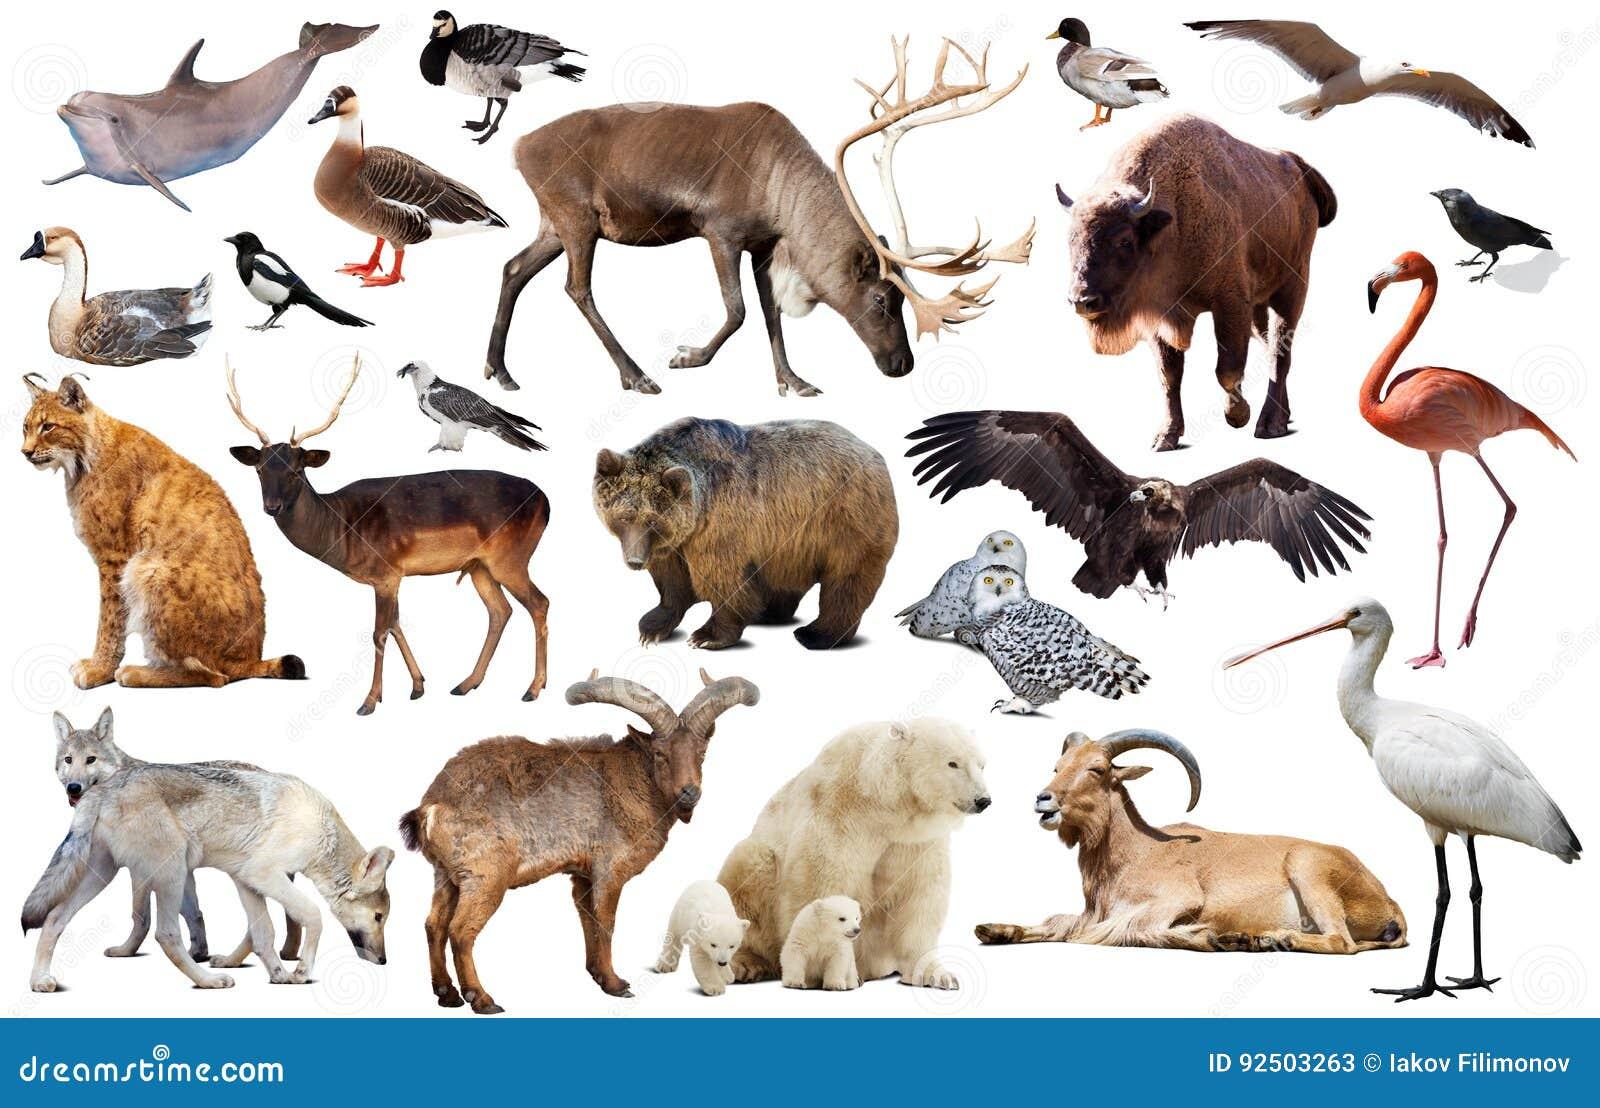 djur i europa